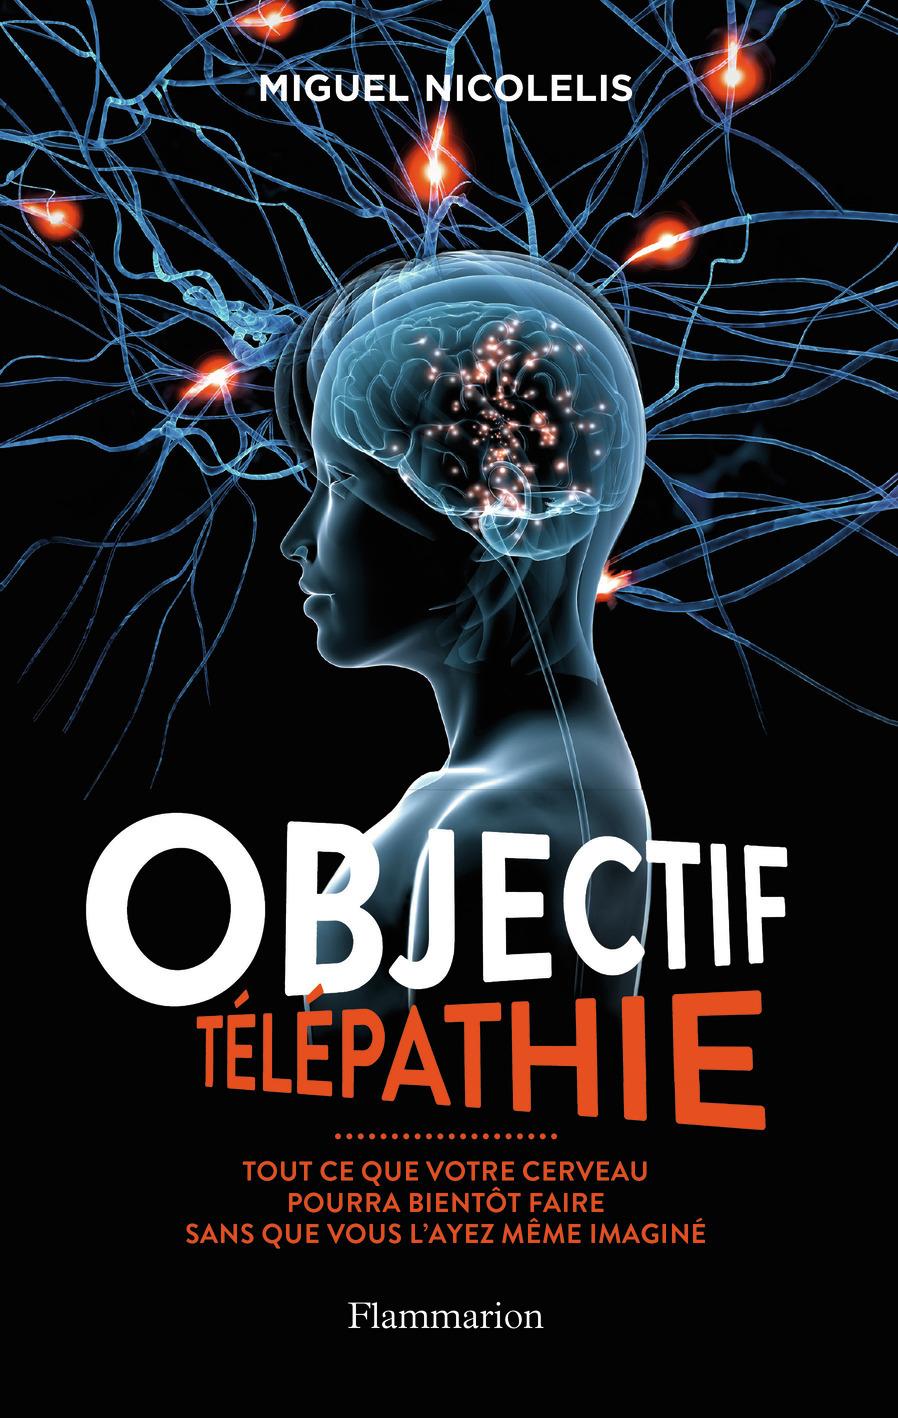 OBJECTIF TELEPATHIE